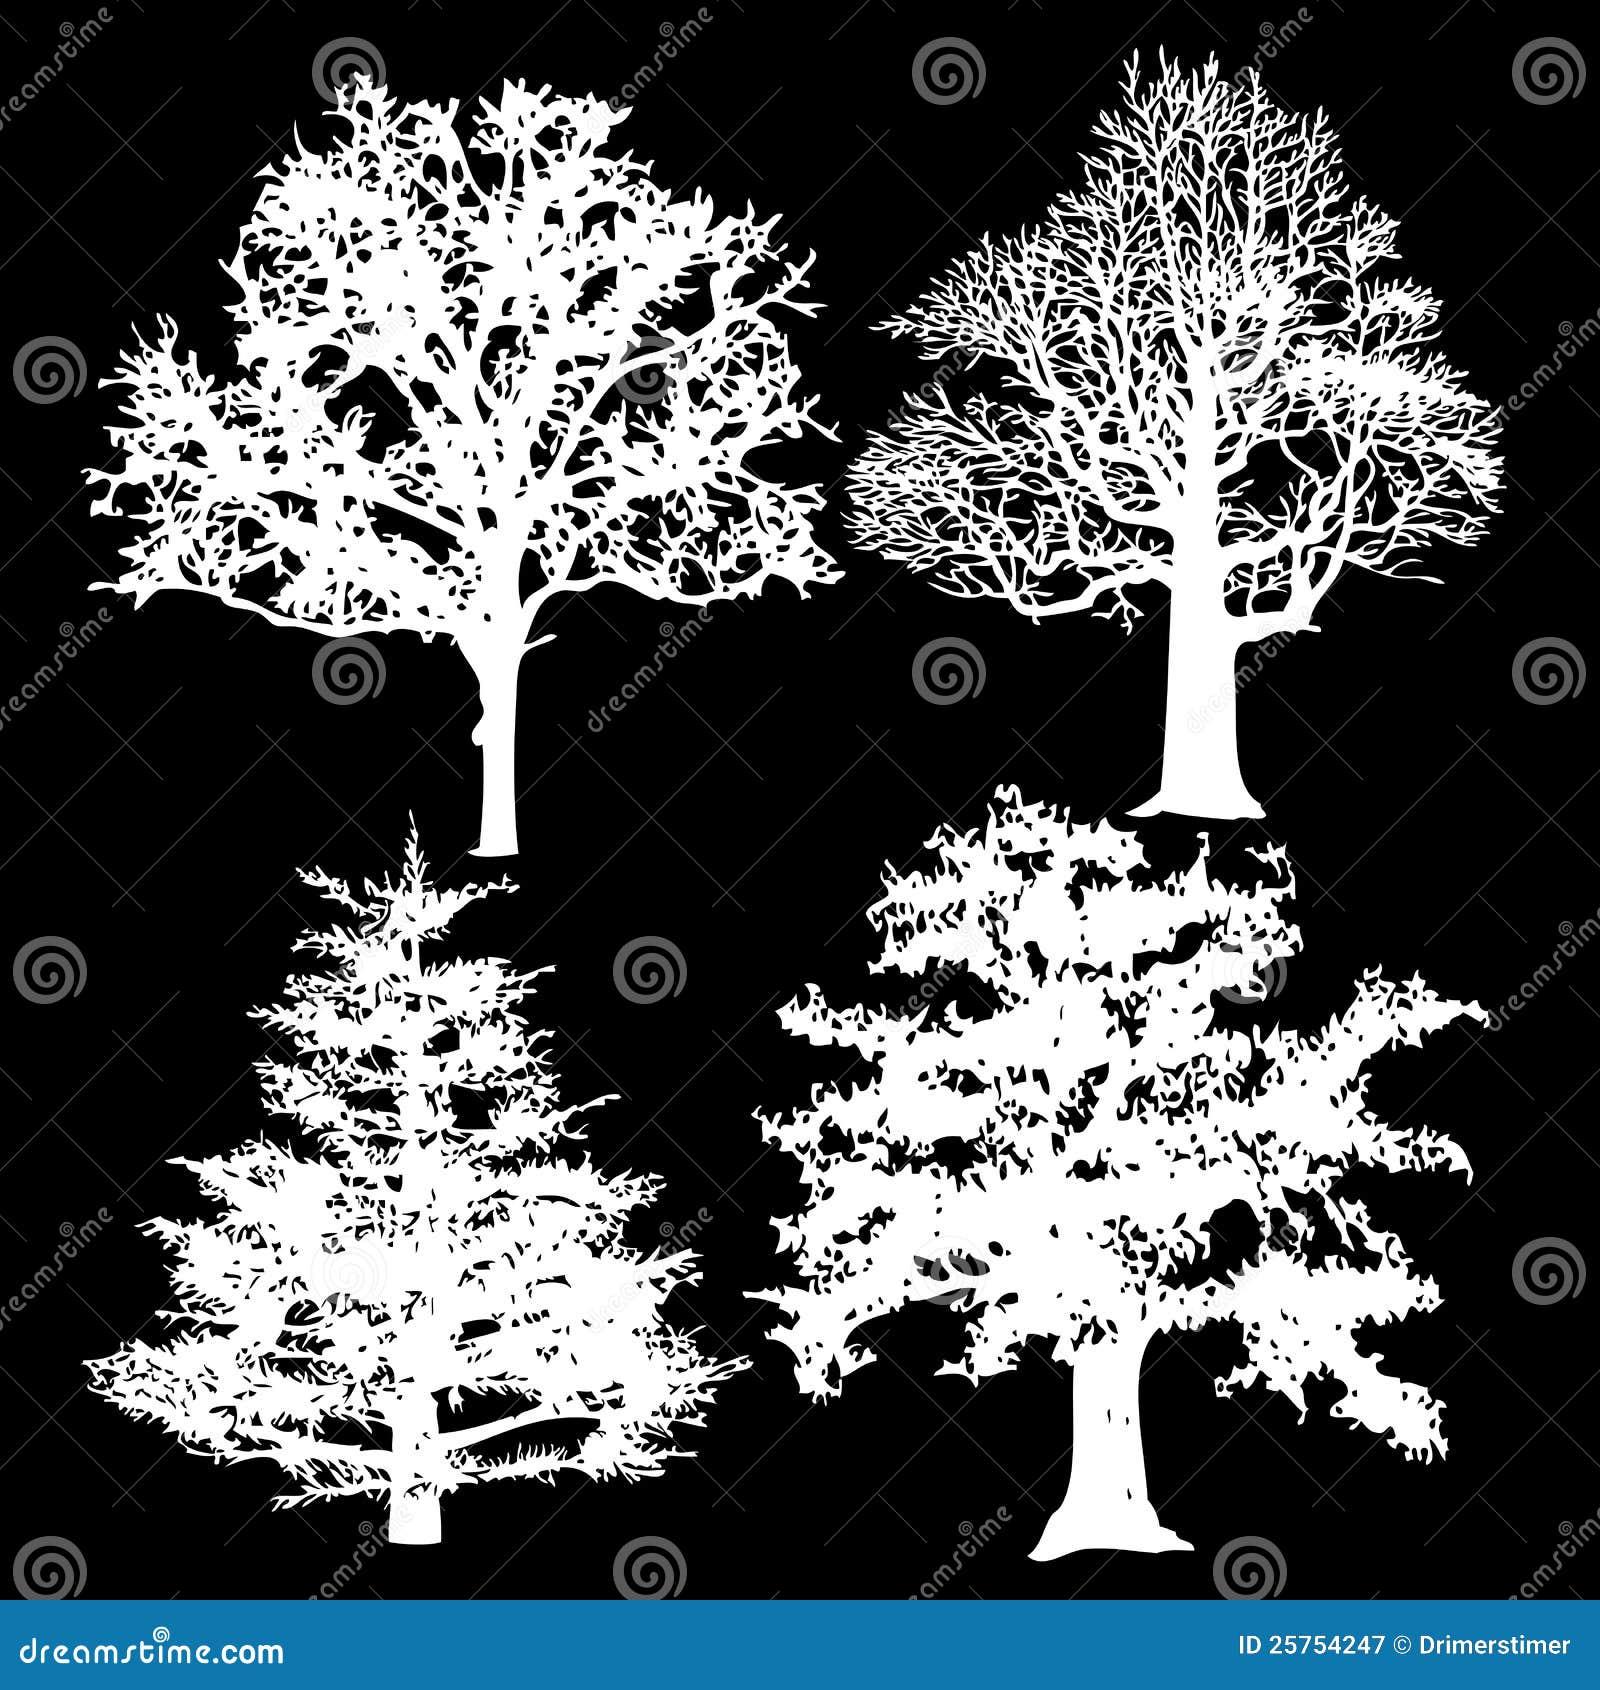 Black Flower On White Background Royalty Free Stock: White Trees On A Black Background Royalty Free Stock